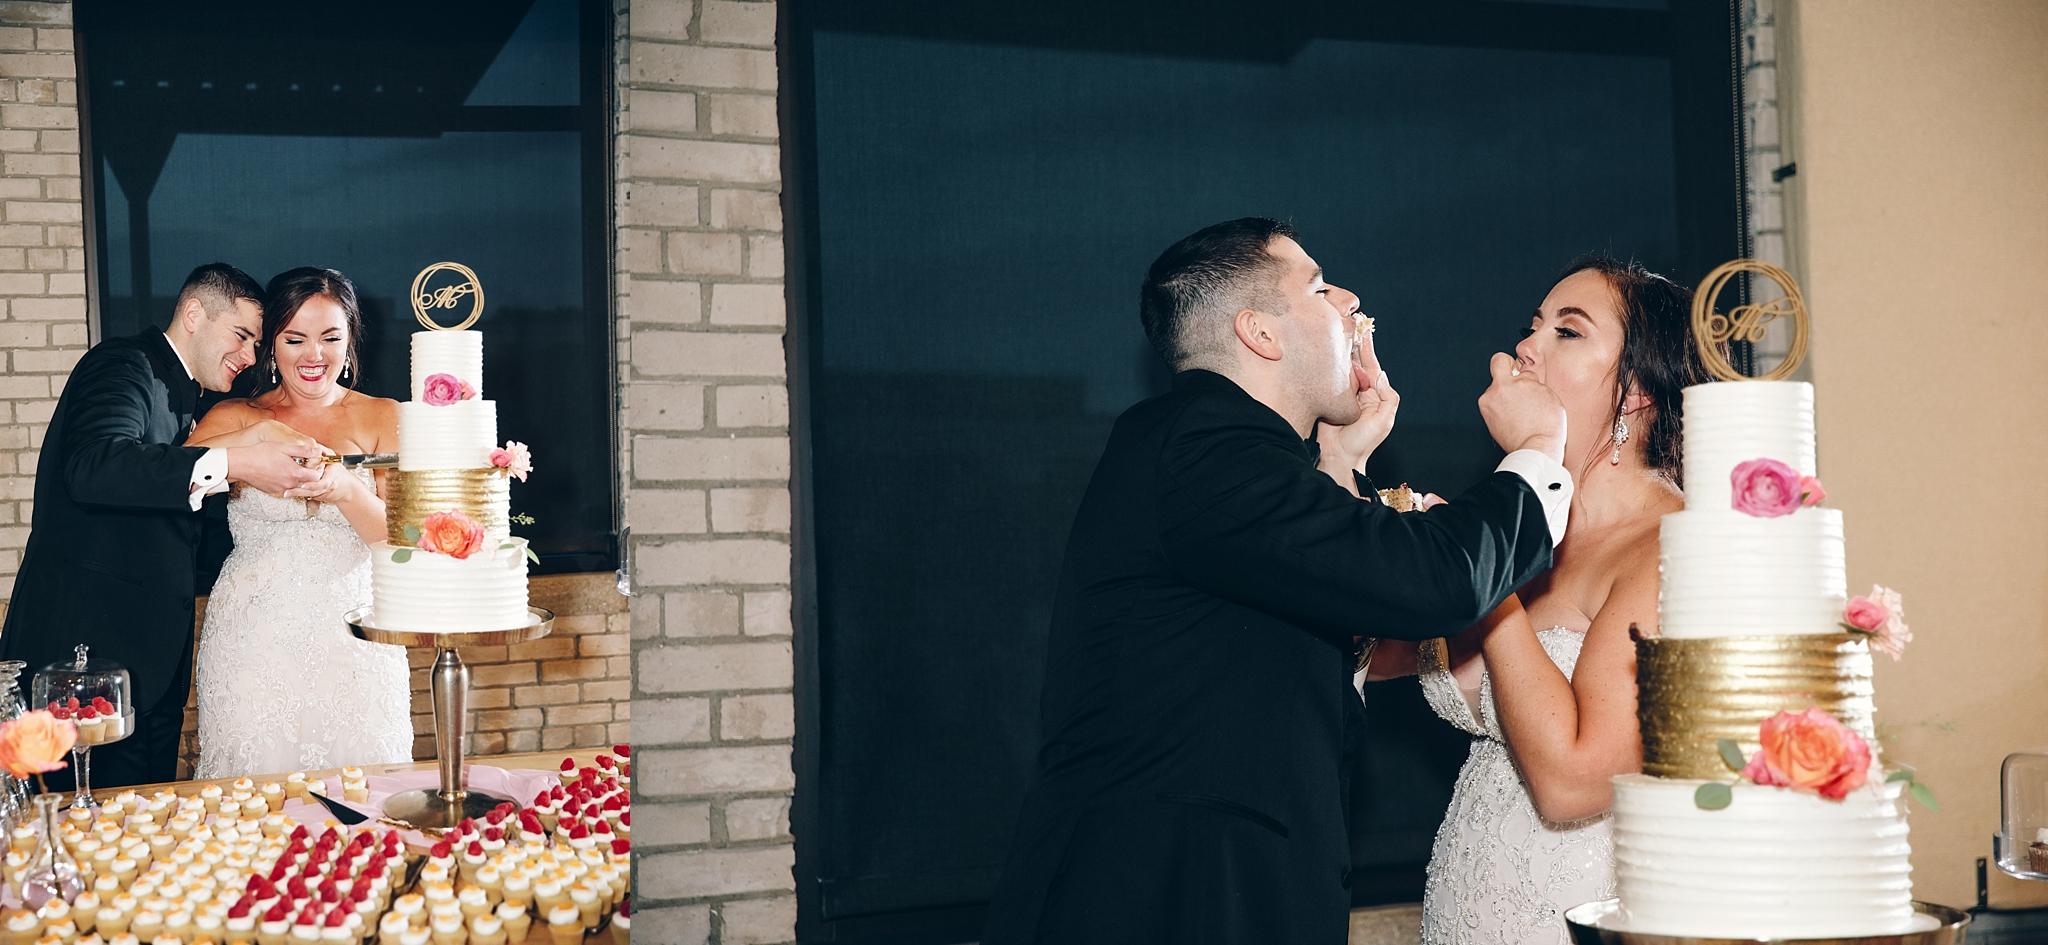 baker-lofts-holland-michigan-wedding-photographer_0398.jpg